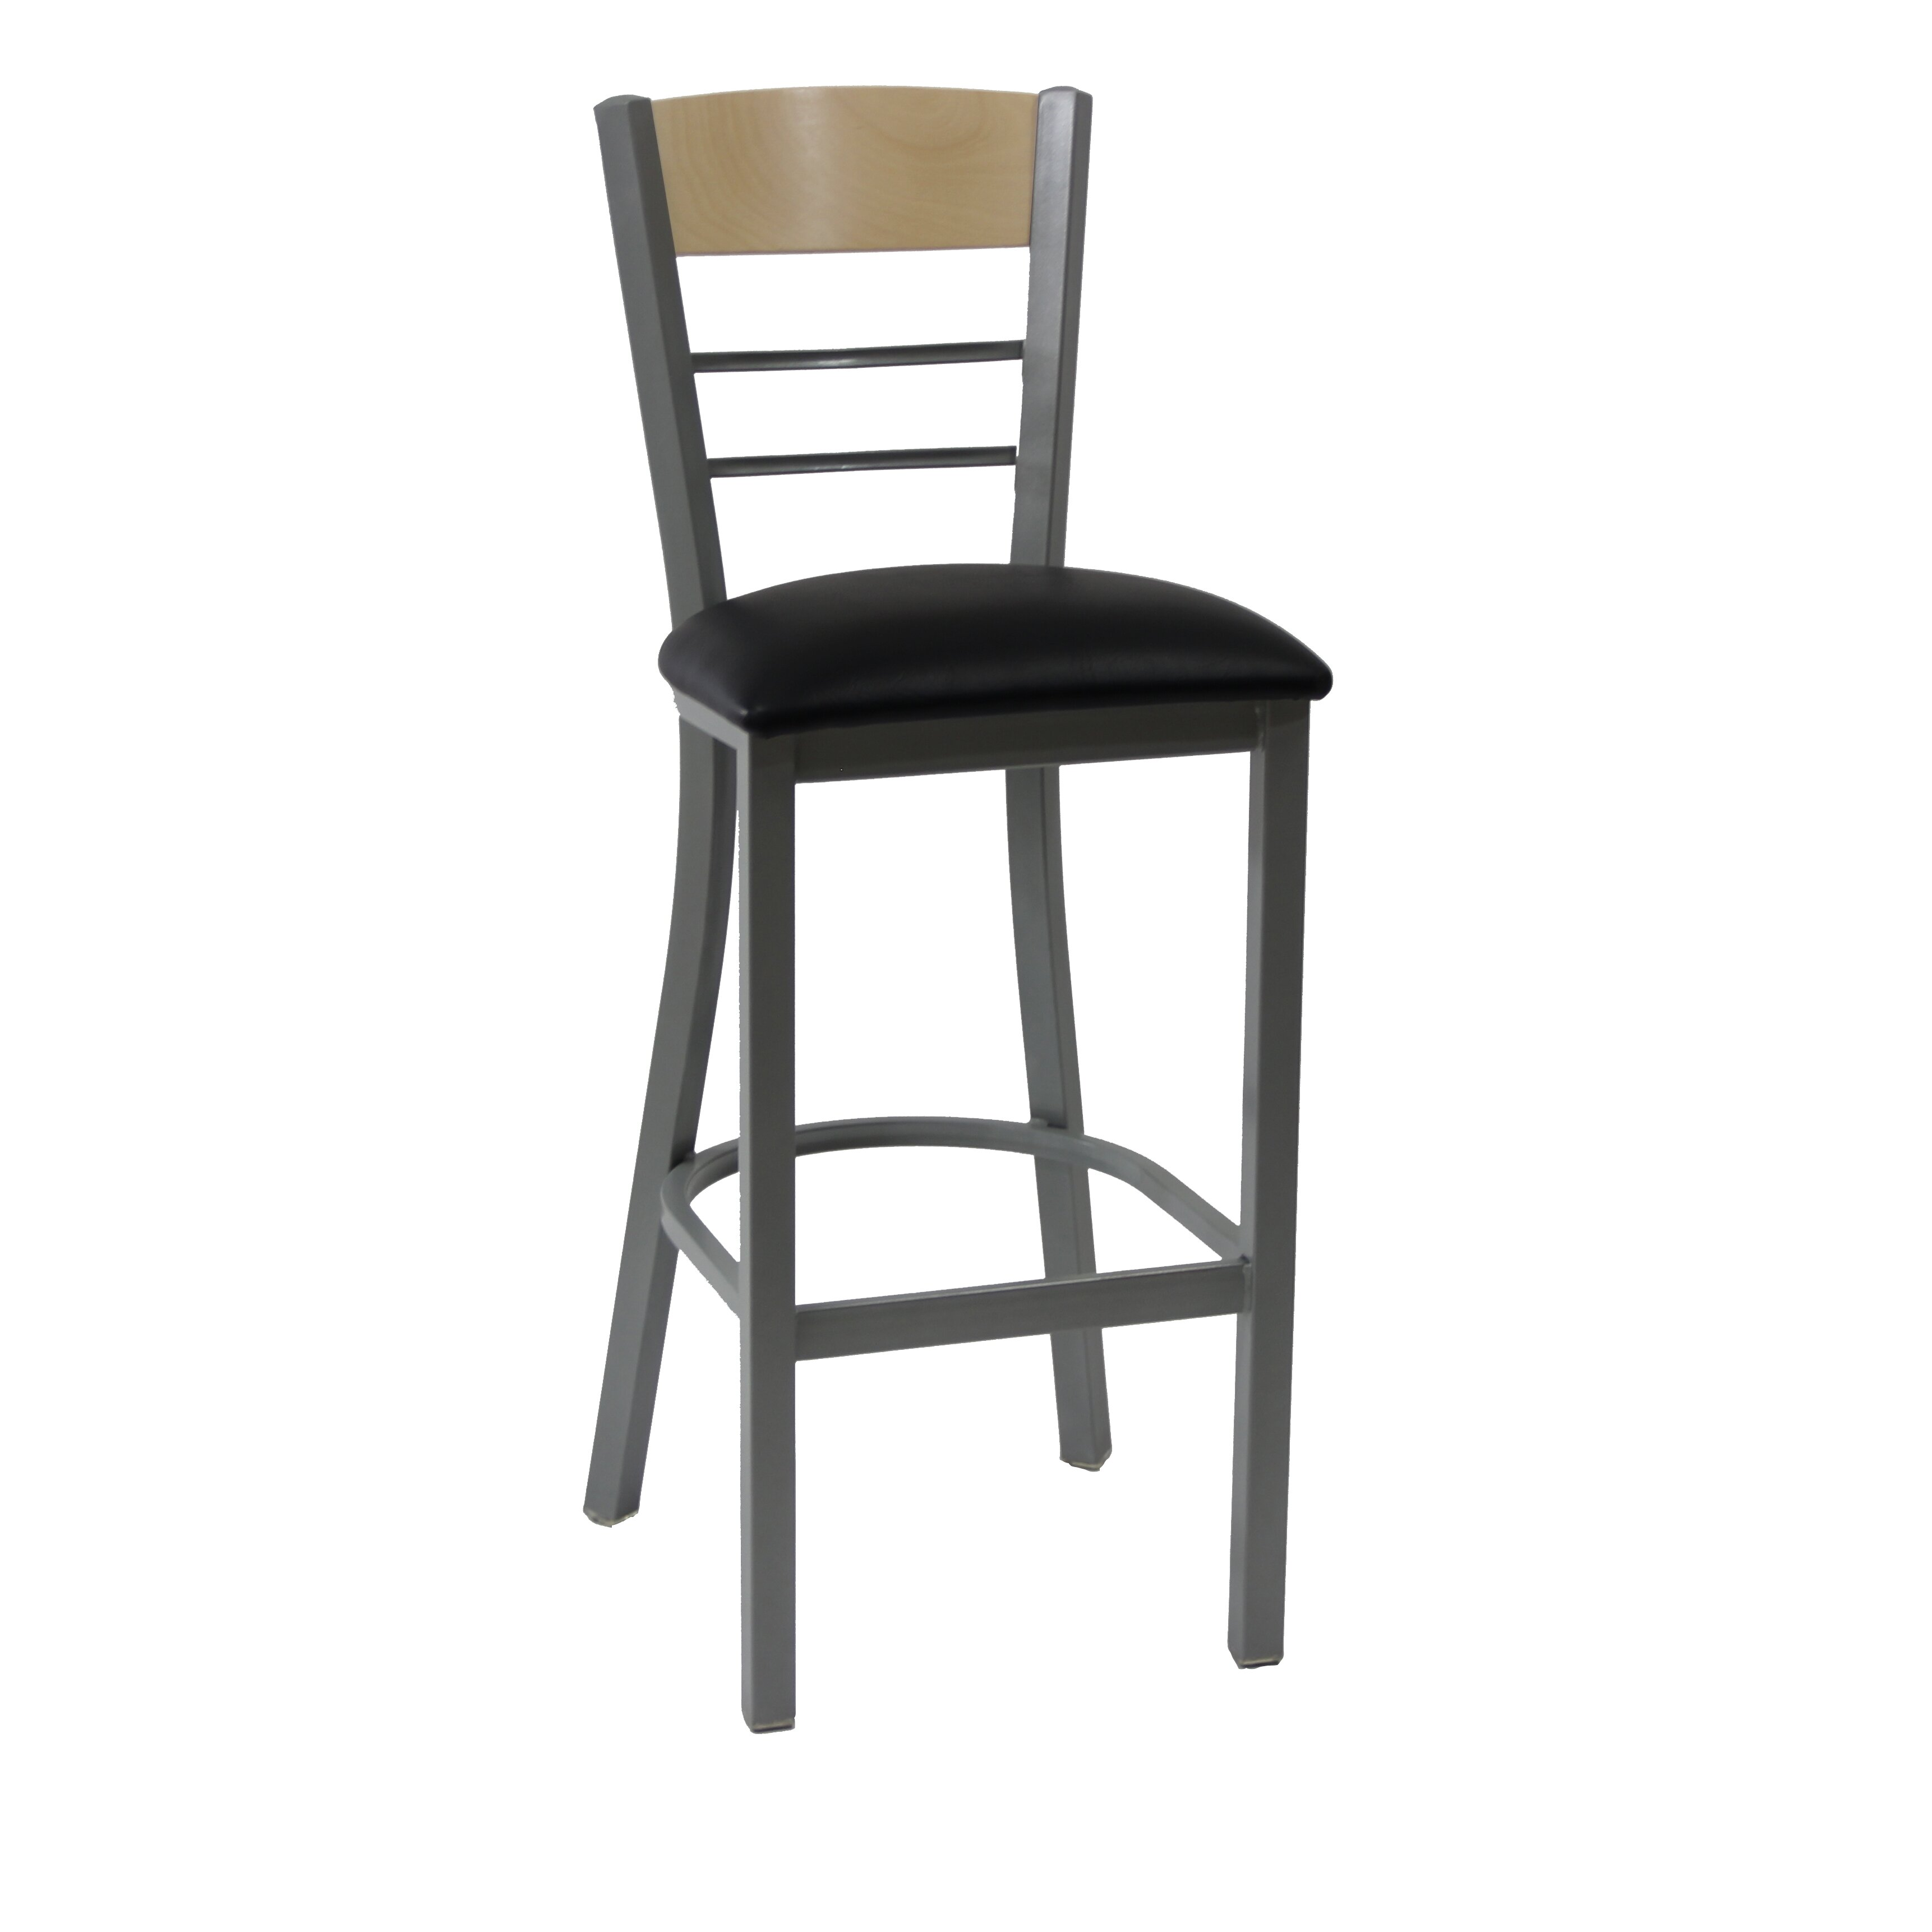 30 counter stools 28 images polivaz nashville 30 quot  : Daniel Paul Chairs 30 Bar Stool from wallpapersist.com size 3445 x 3445 jpeg 356kB